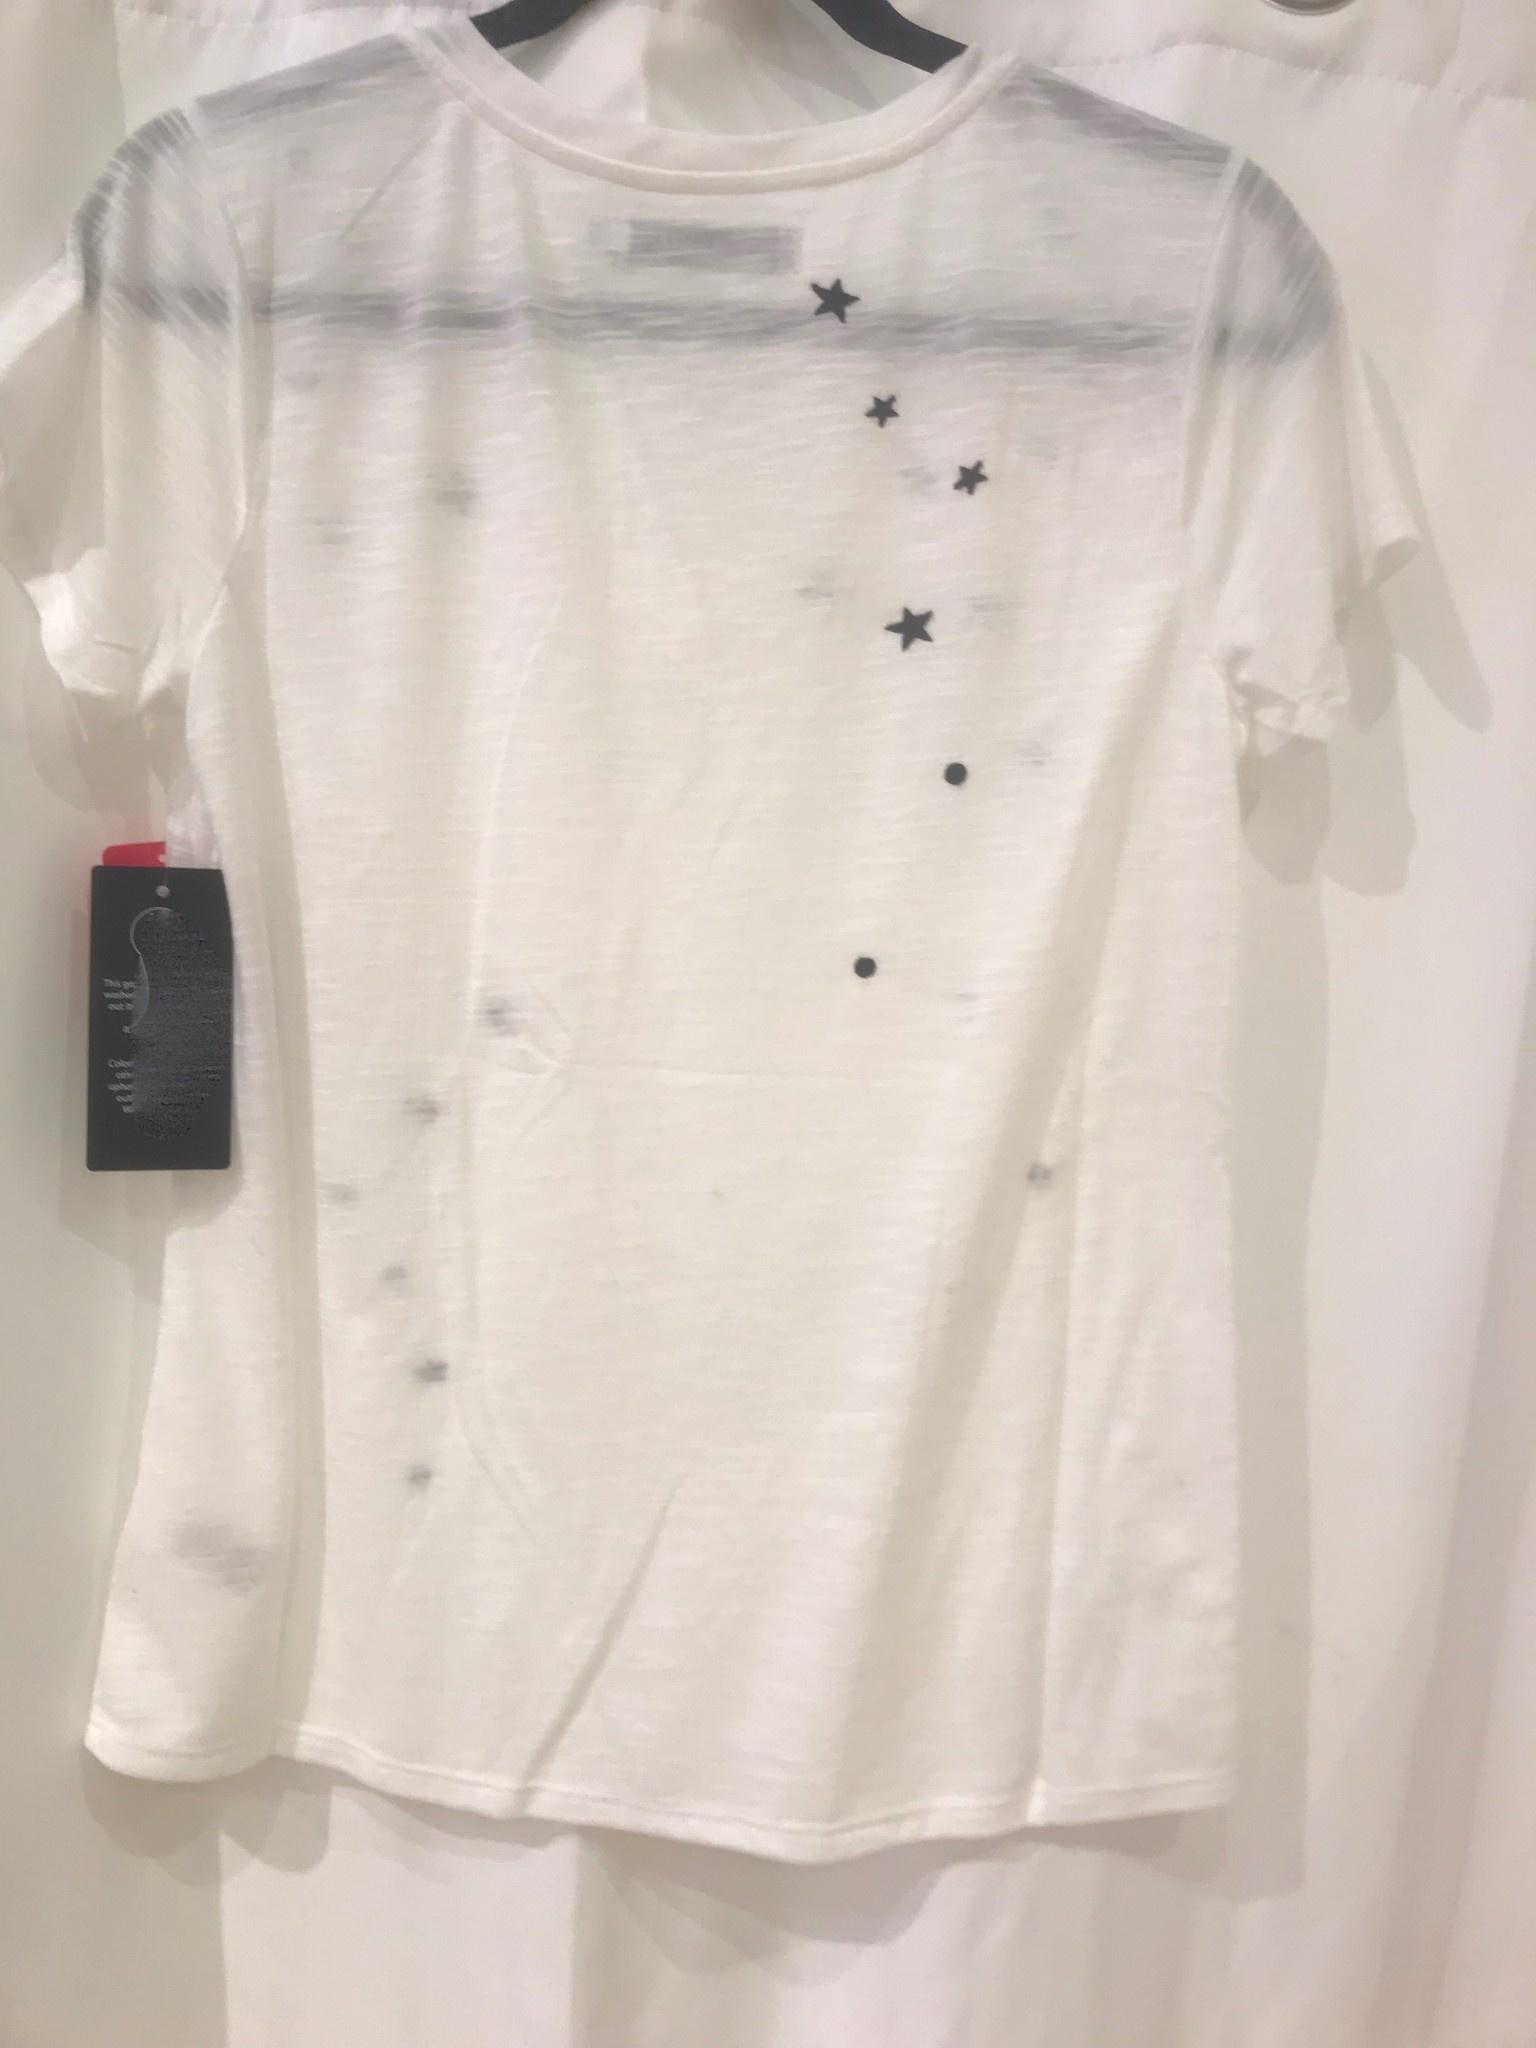 Star Embroidered Tee Shirt